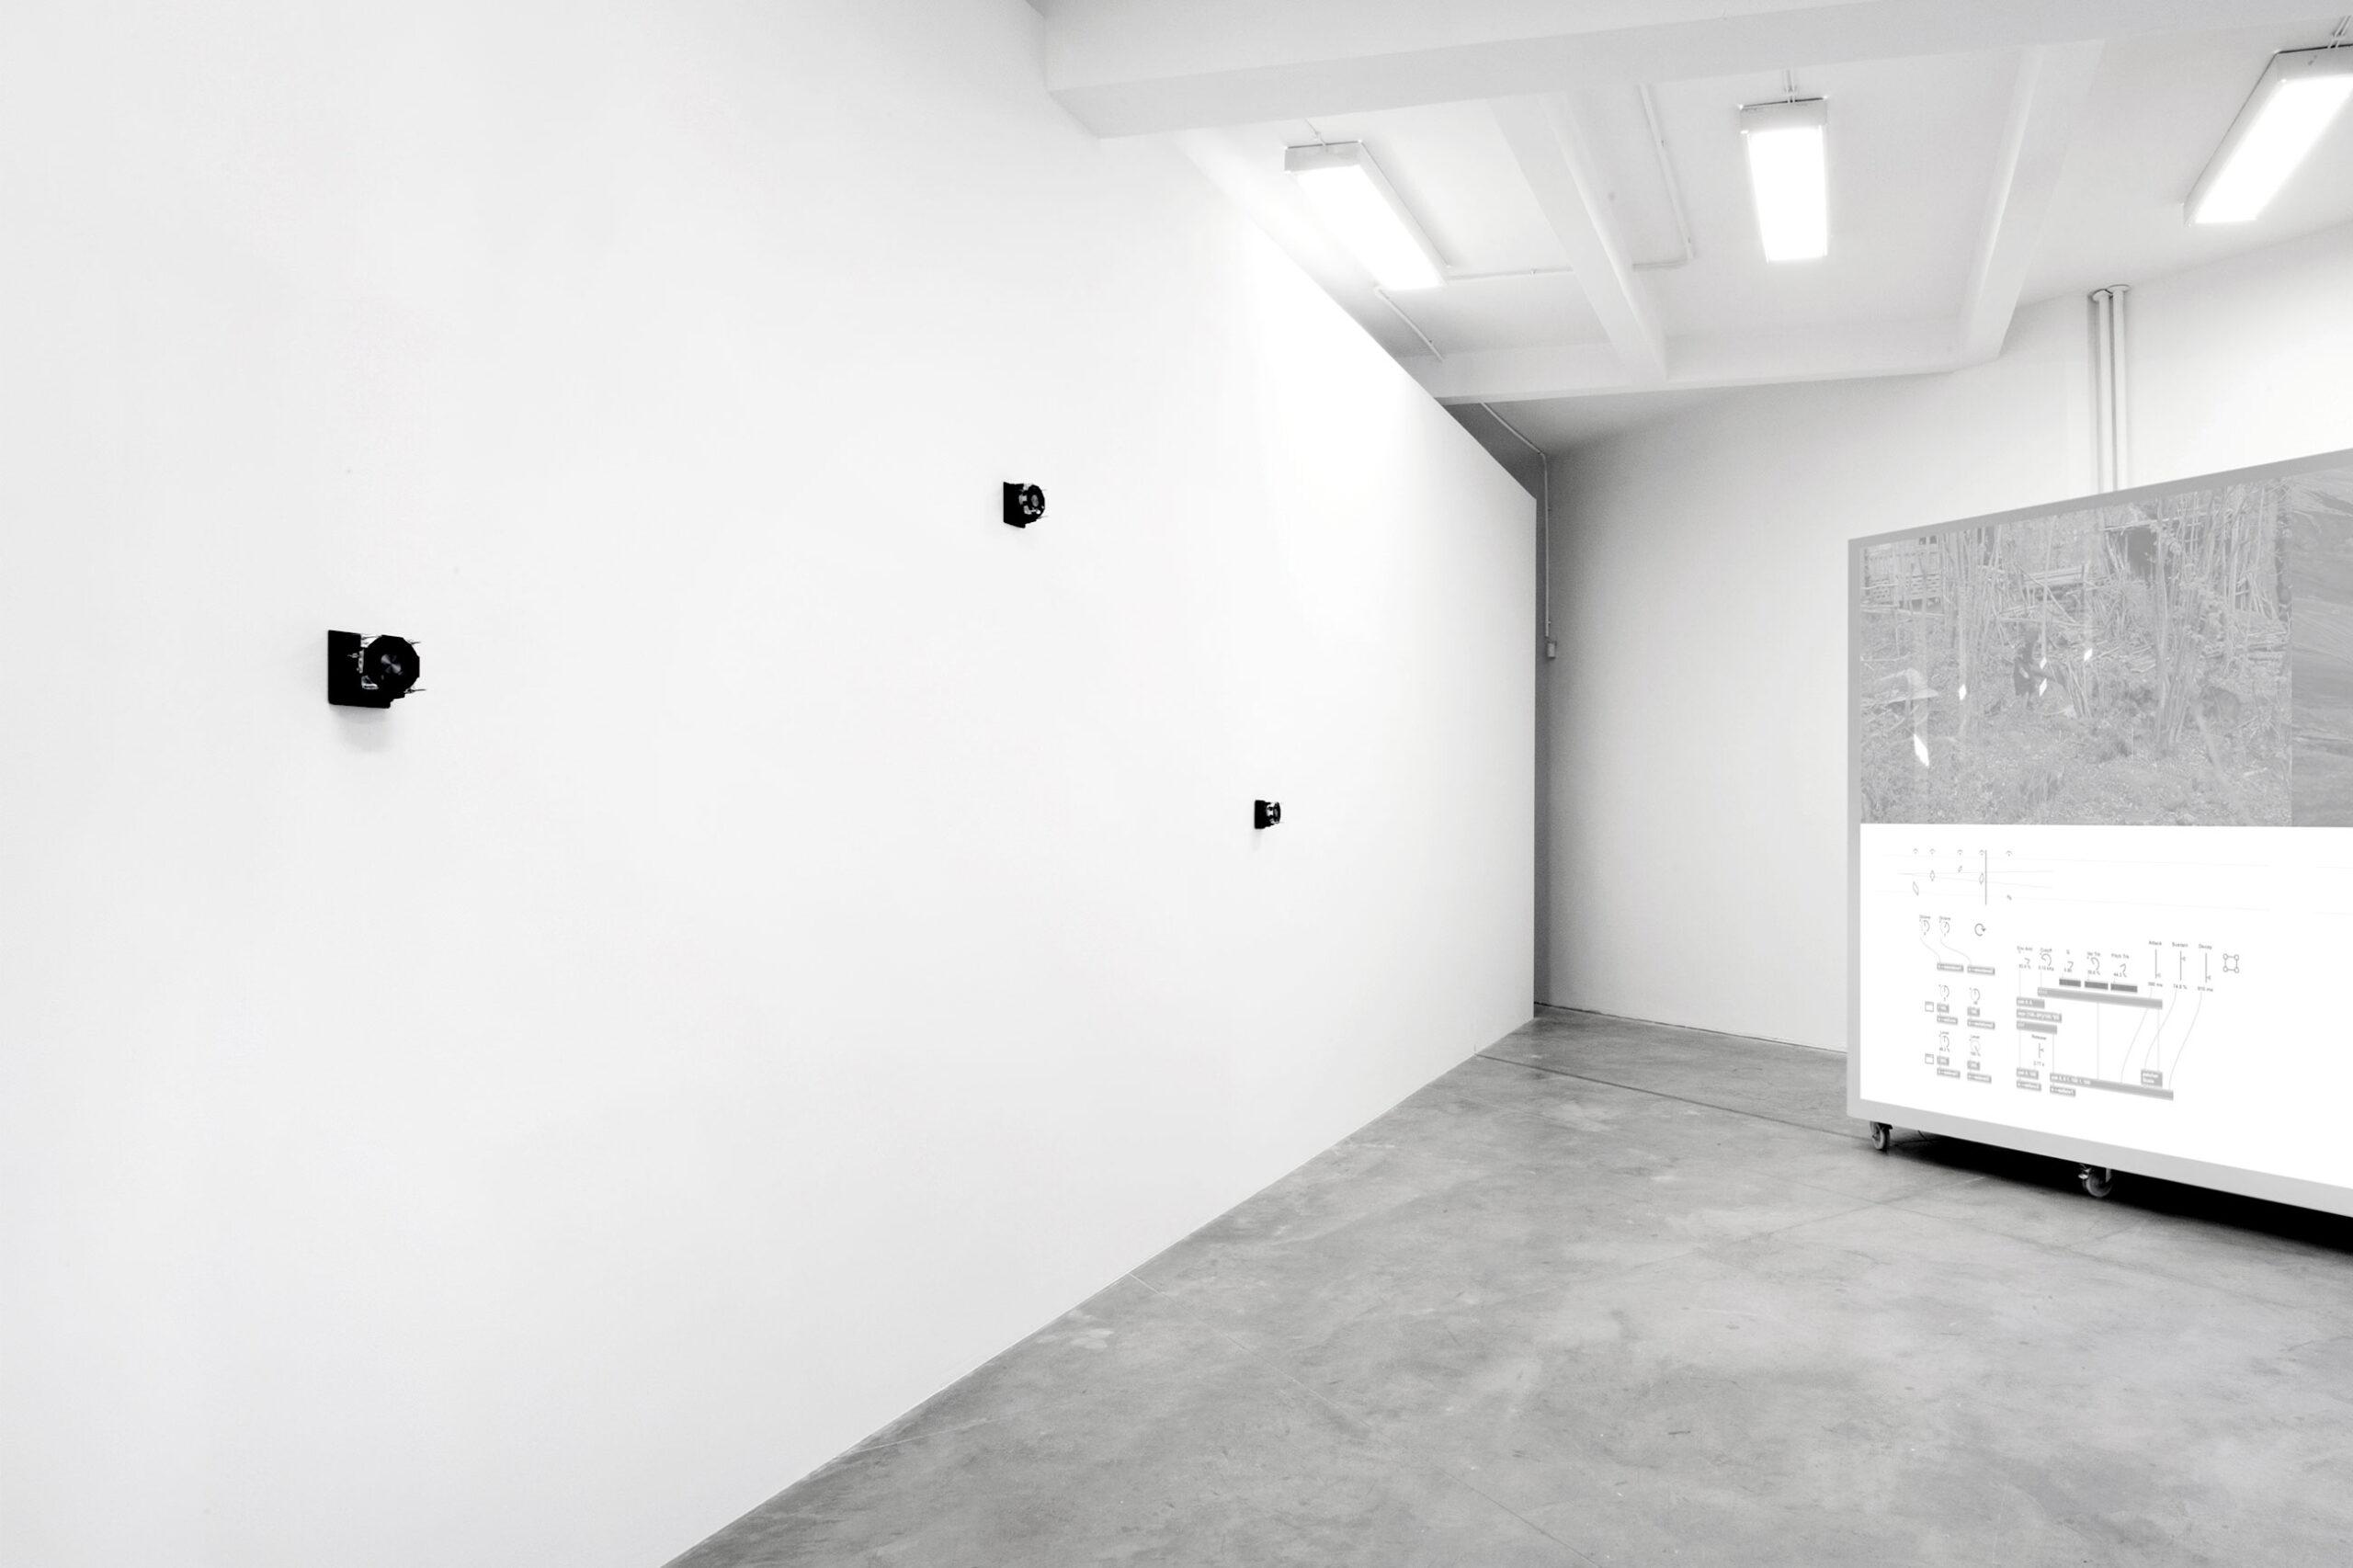 Jacek Doroszenko - Silent Souvenirs, exhibition view 3, Fait Gallery, Brno